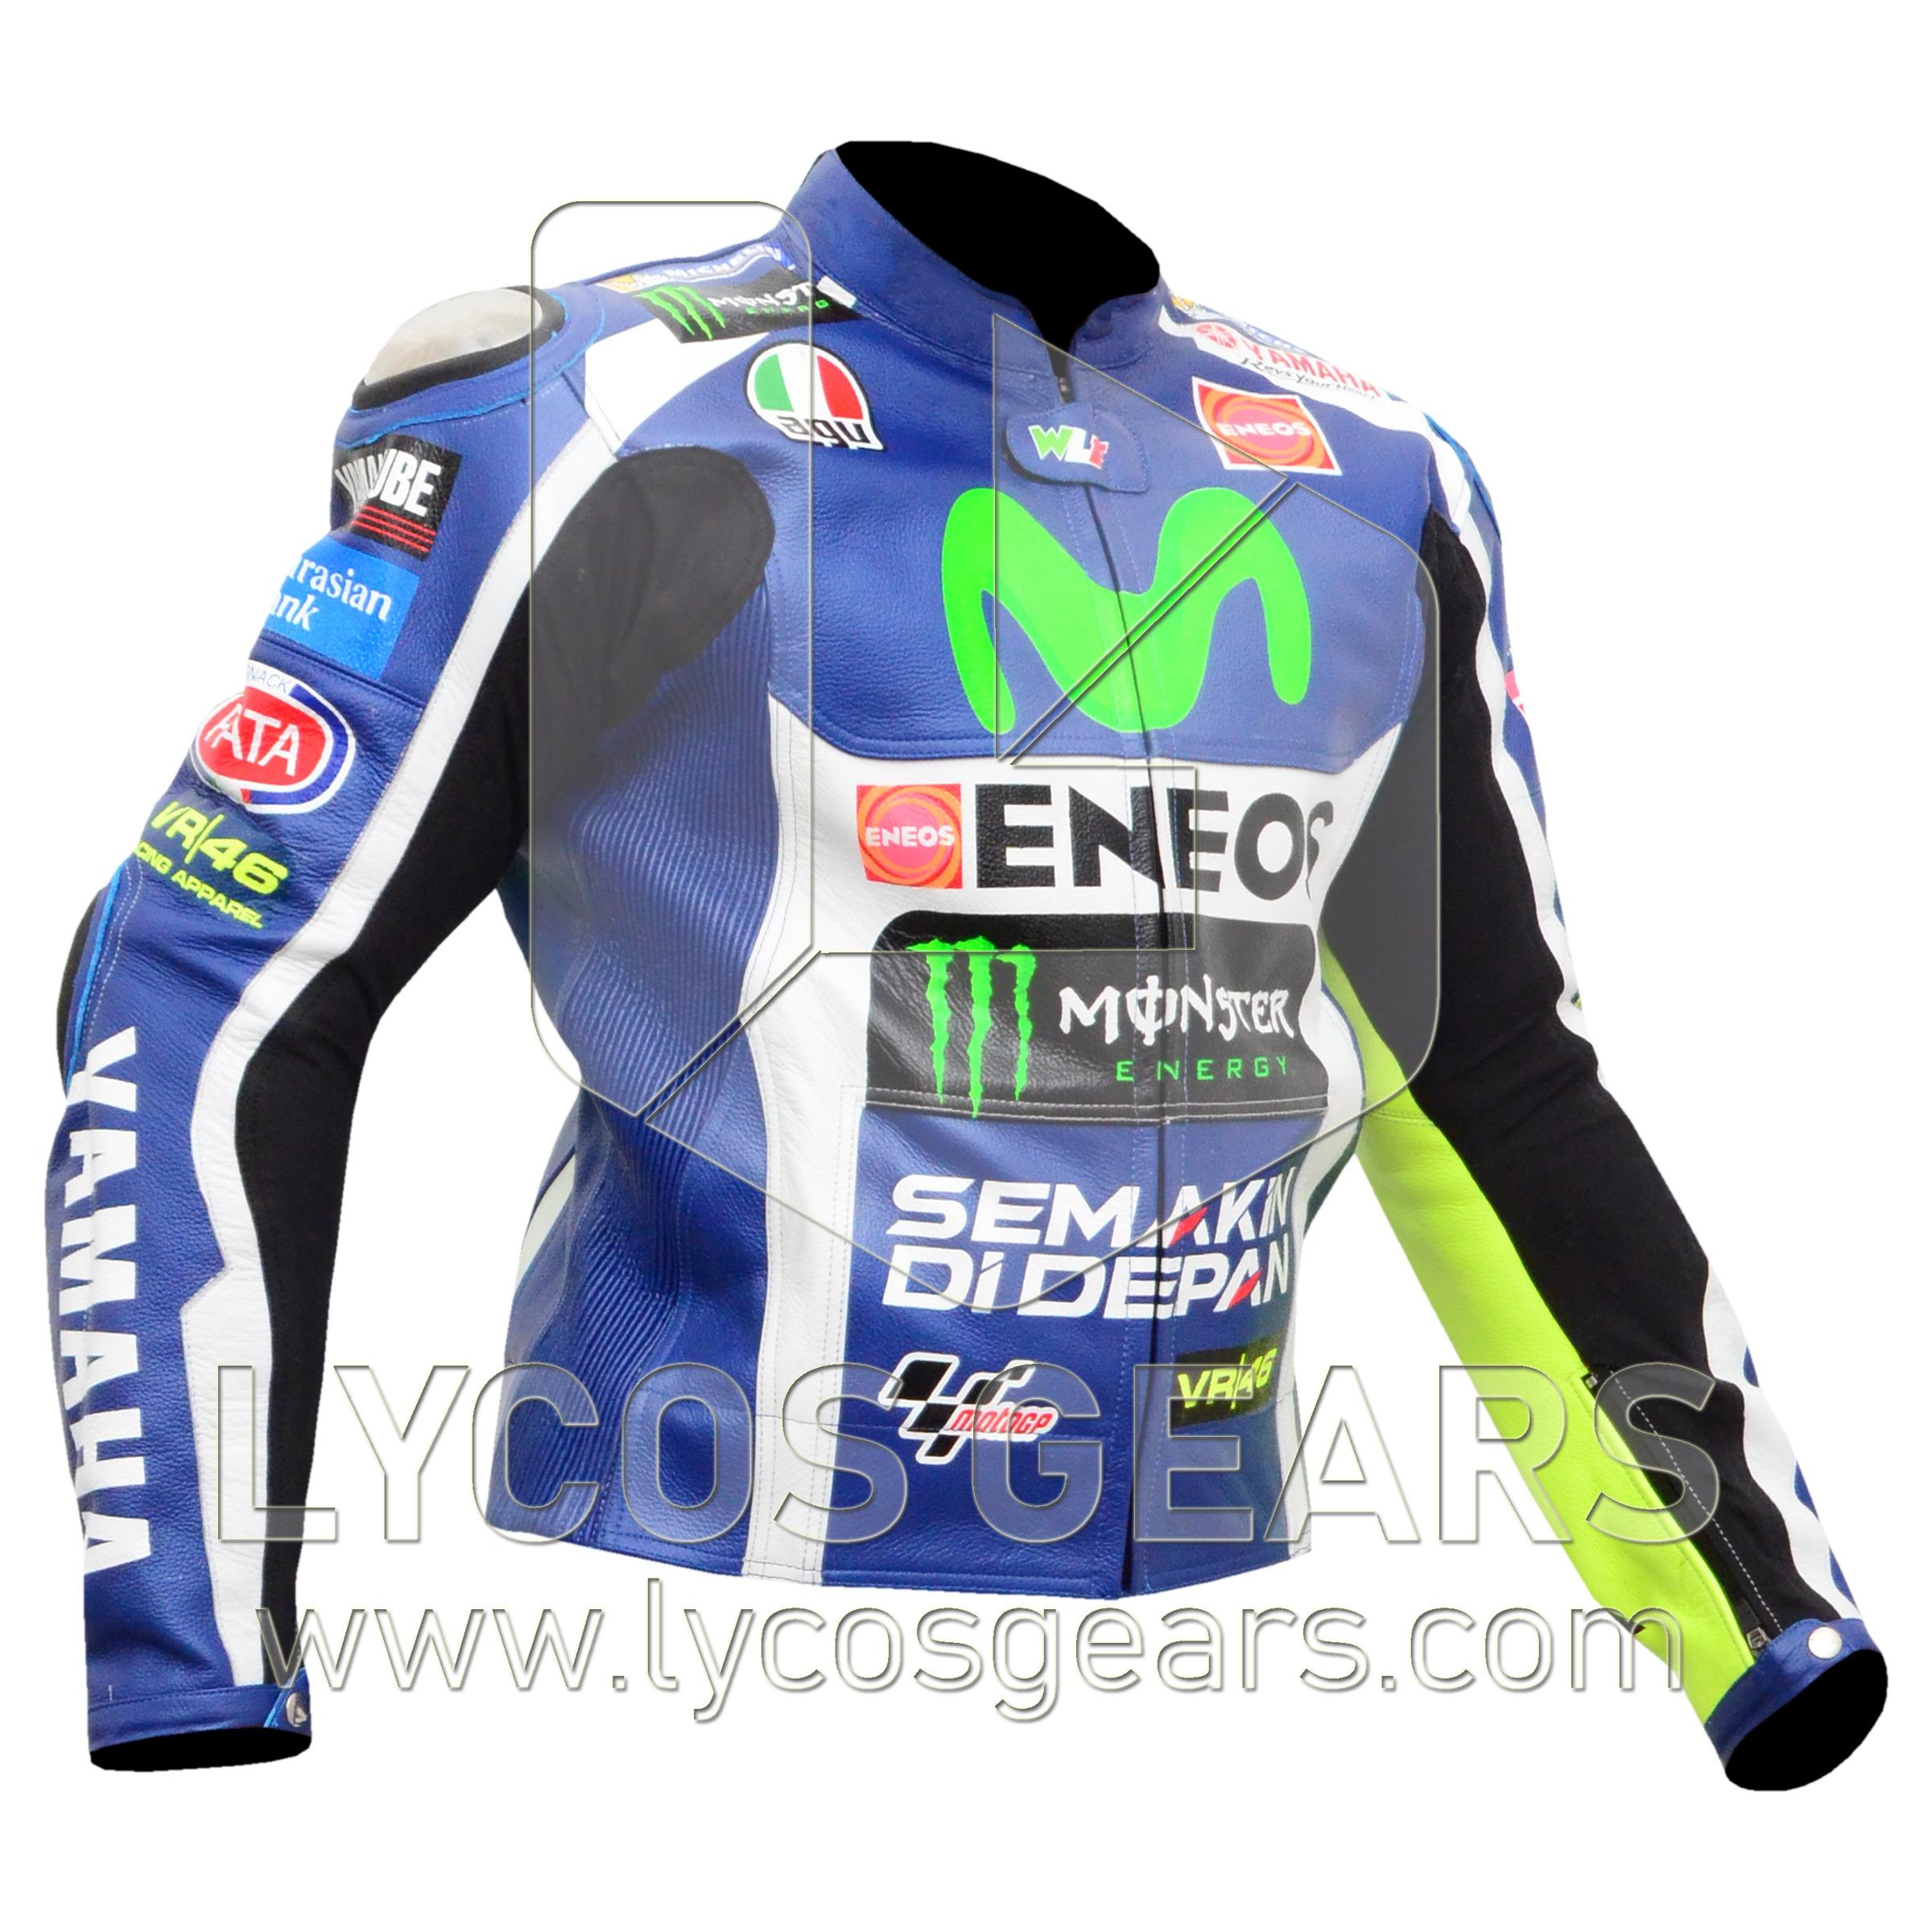 Valentino Rossi VR46 Motorbike Racing Leather Jacket 2016